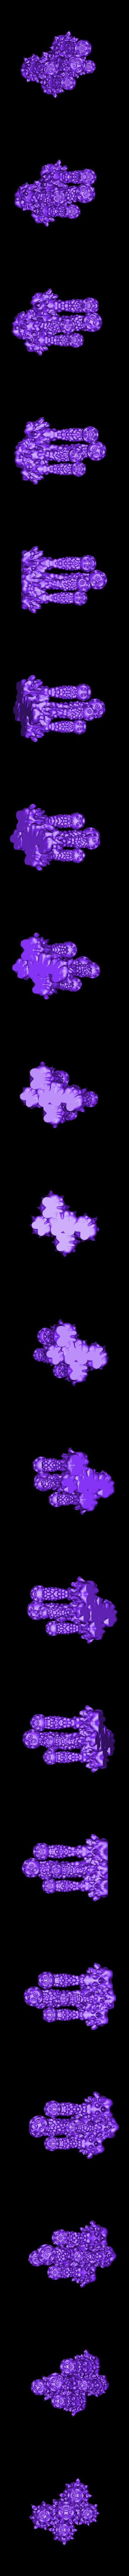 AlienPlant3Clump.stl Download free STL file Alien Flora series 3 (any scale) • 3D print model, Dutchmogul